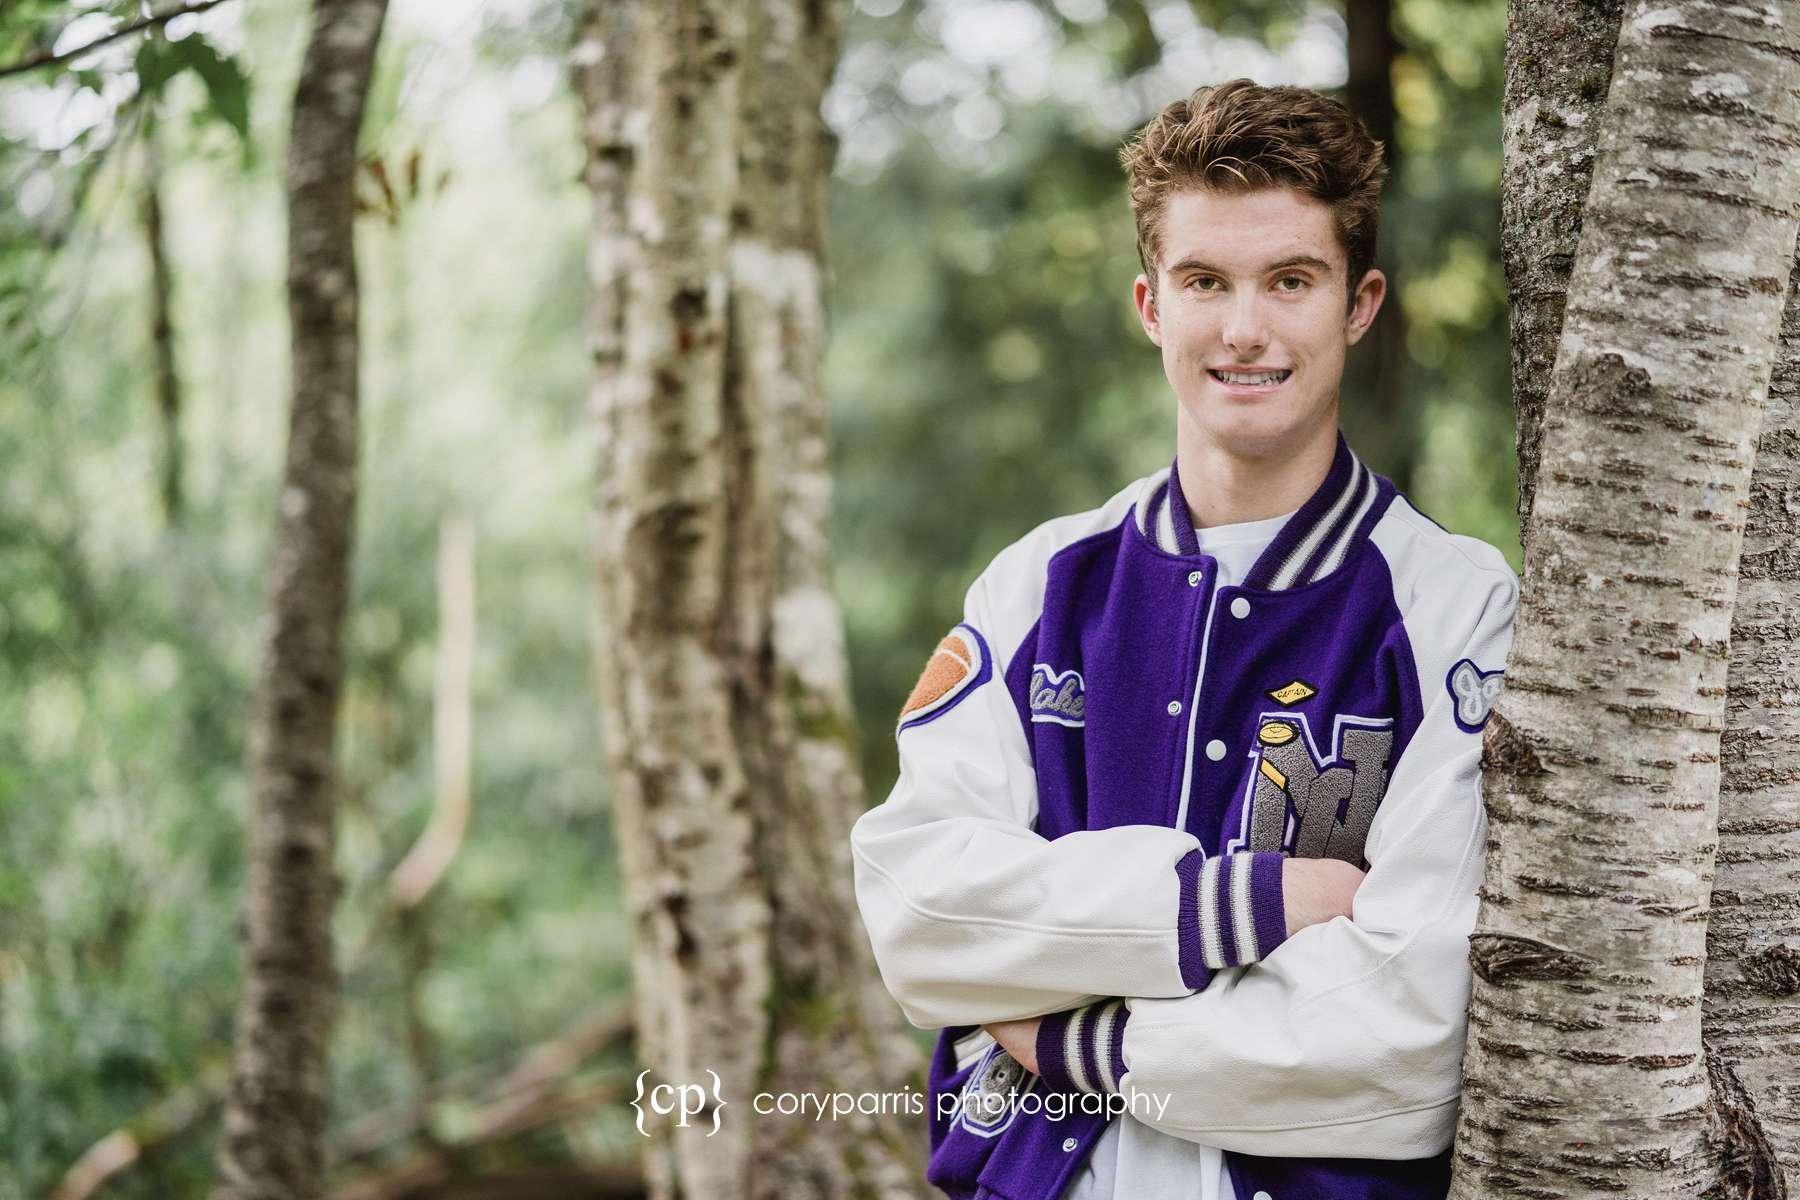 North-Creek-High-School-Senior-Portraits-Bothell-078-edited.jpg